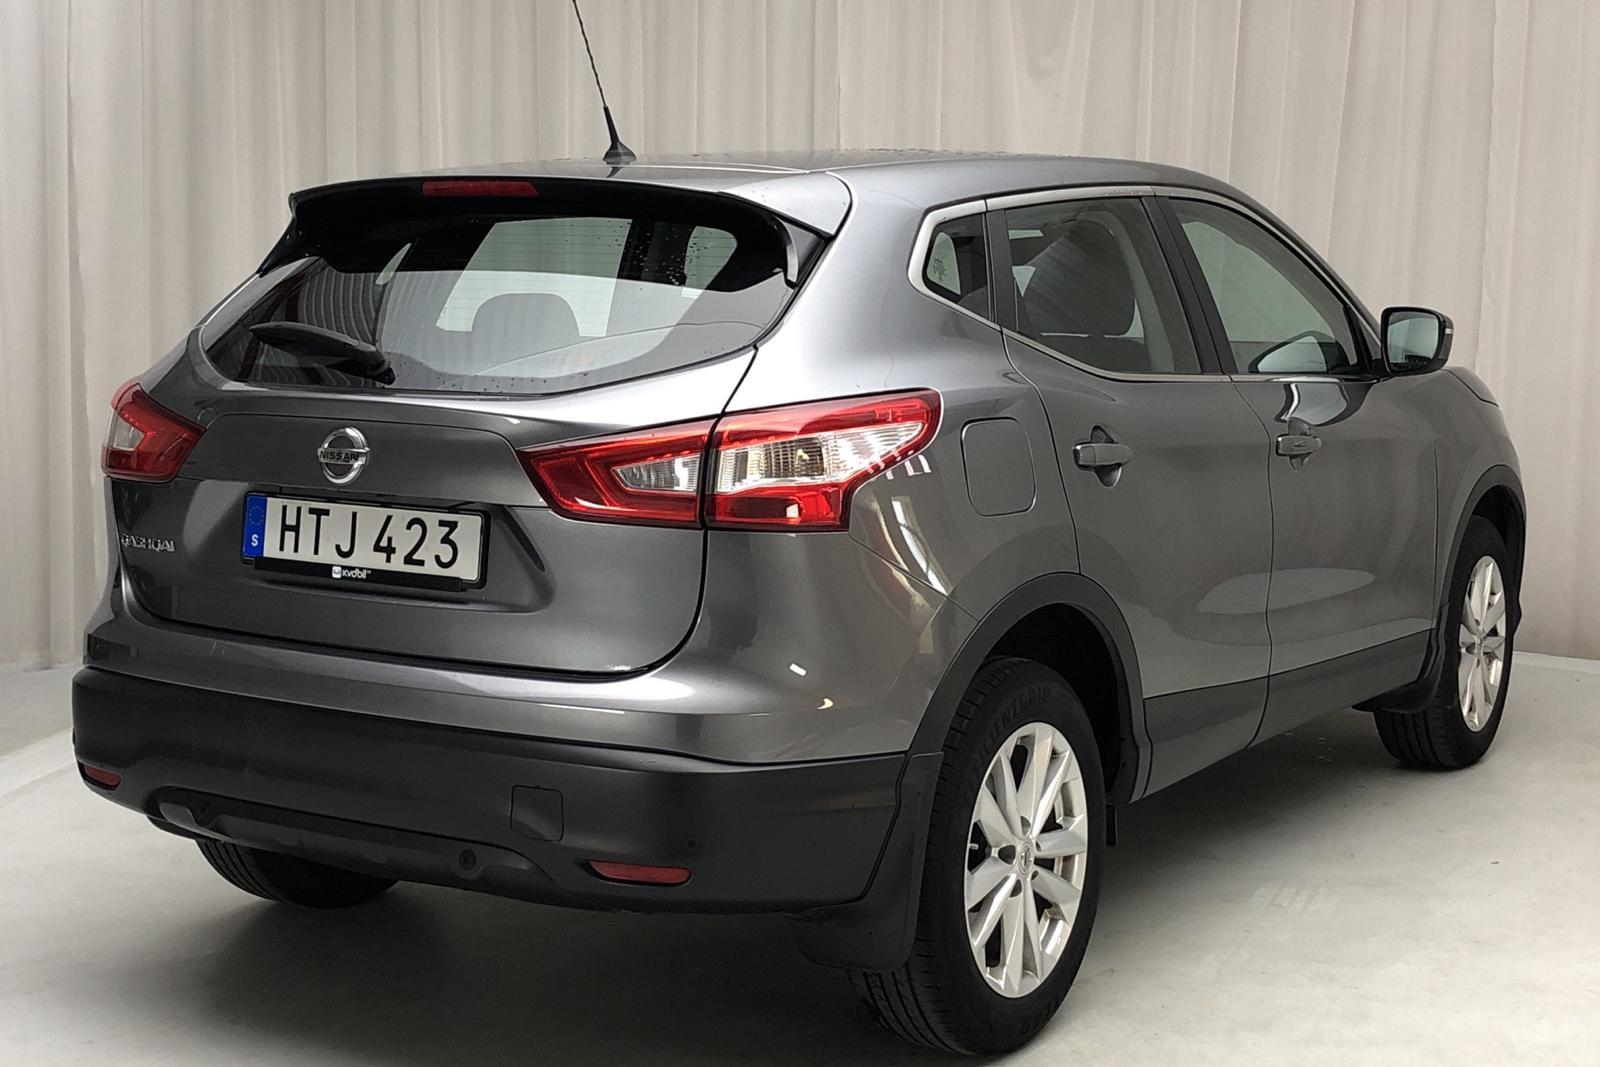 Nissan Qashqai 1.2 (115hk) - 53 000 km - Manual - gray - 2015